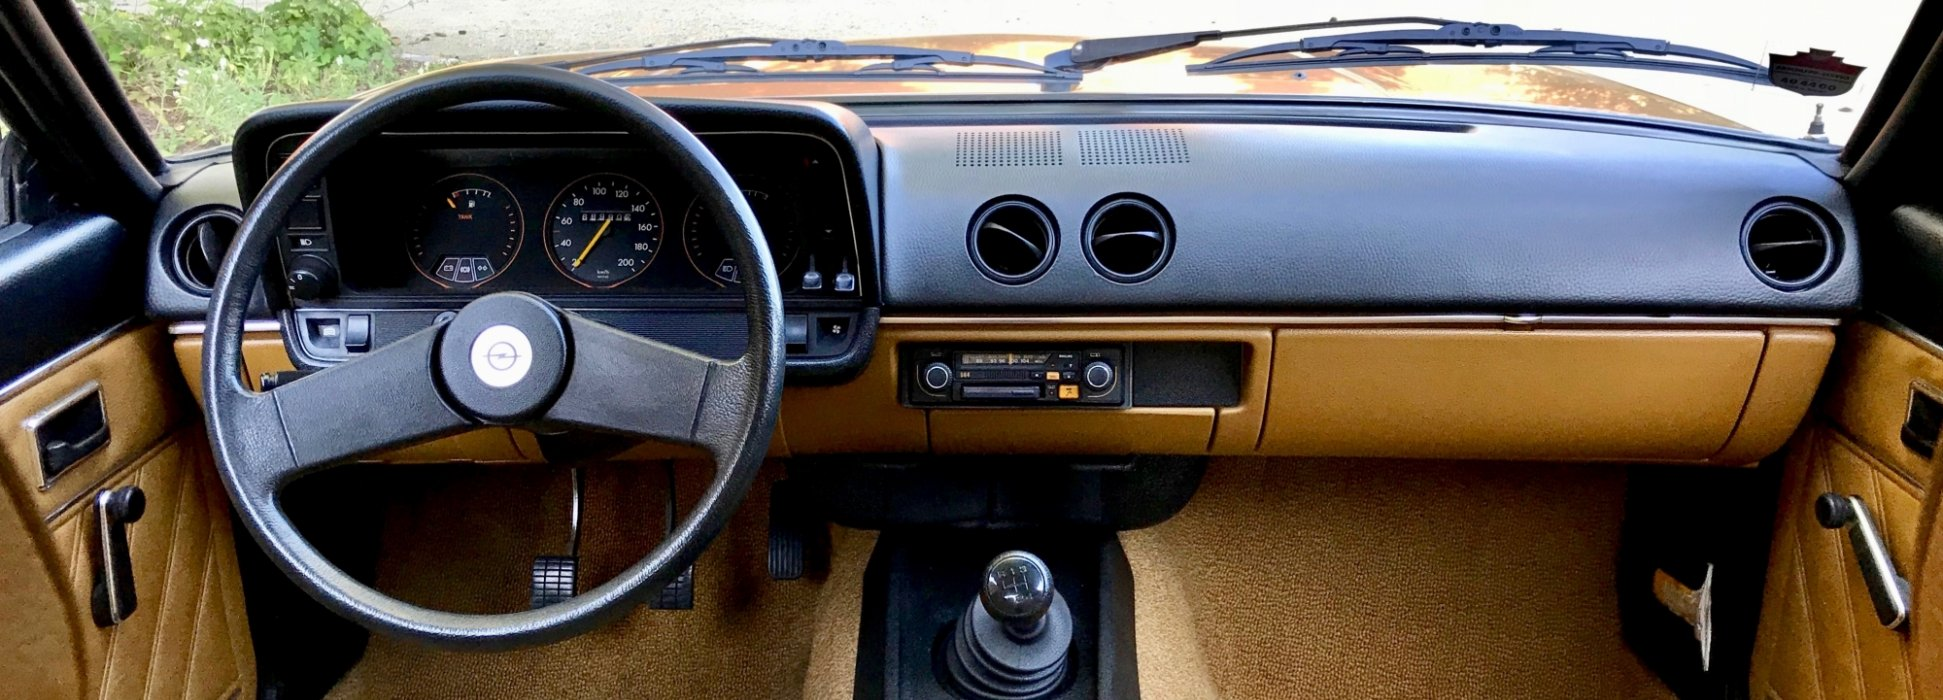 Opel Manta B Coupé 1